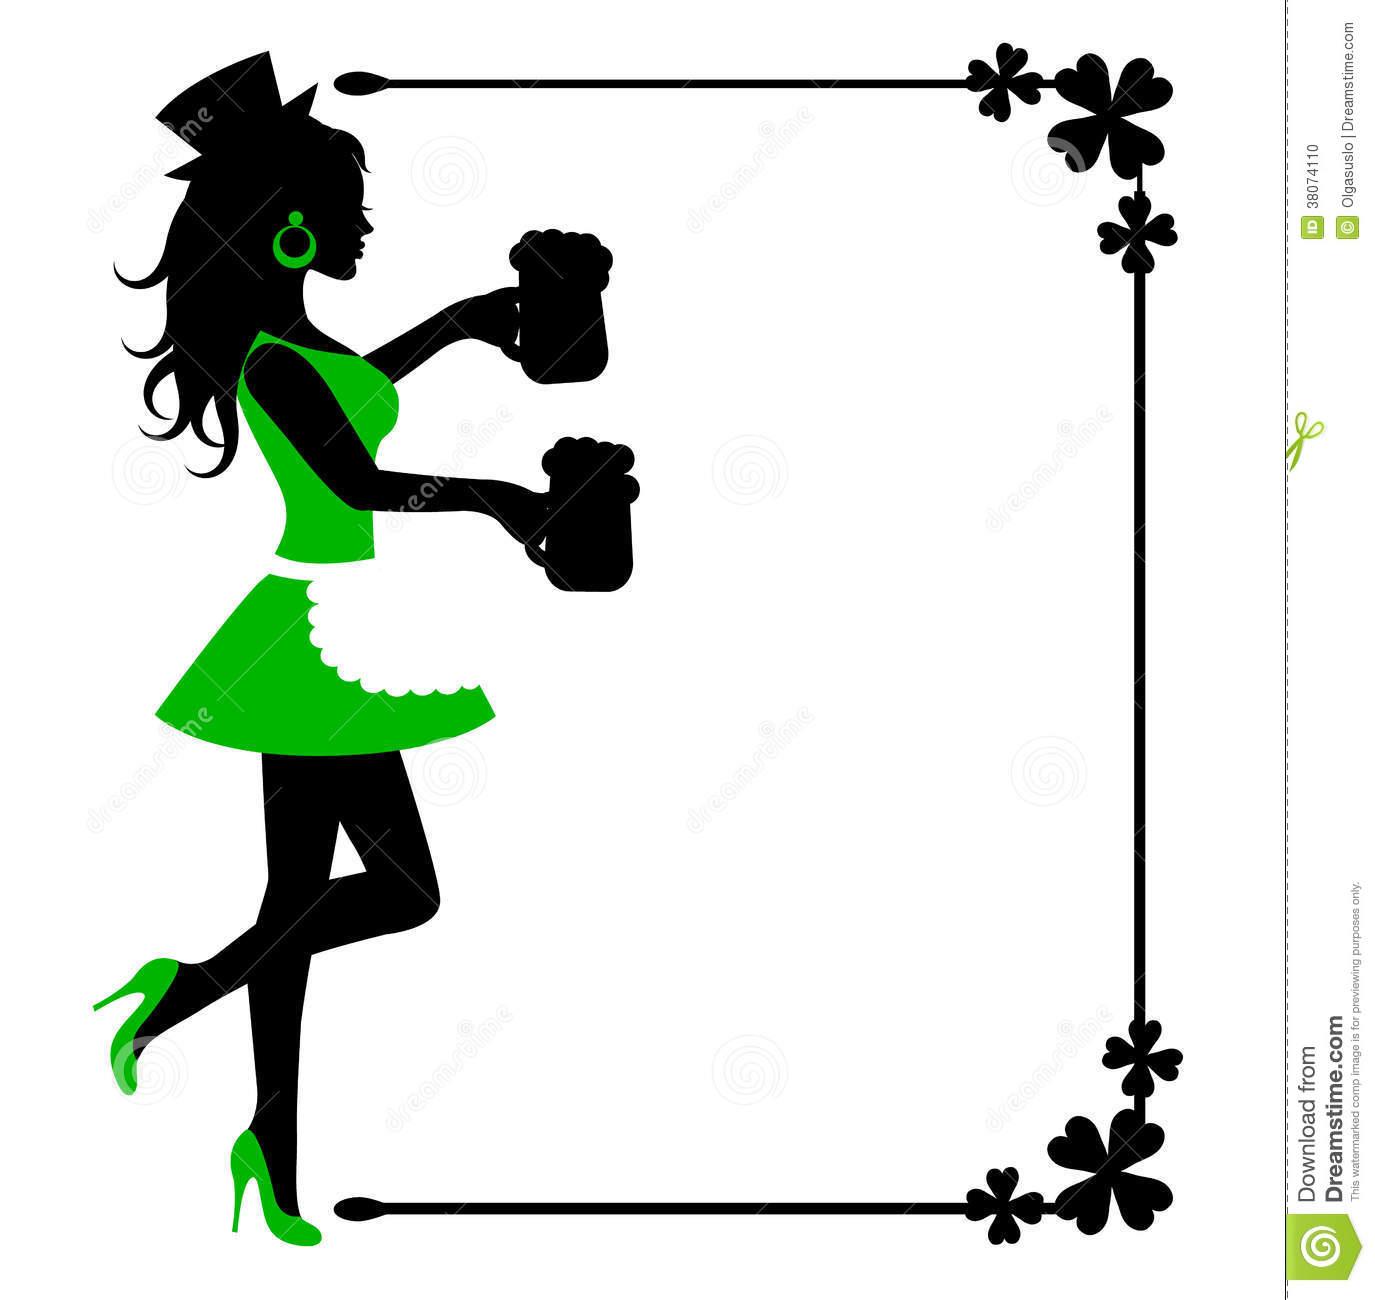 1375x1300 Beer Mug Silhouette Clipart